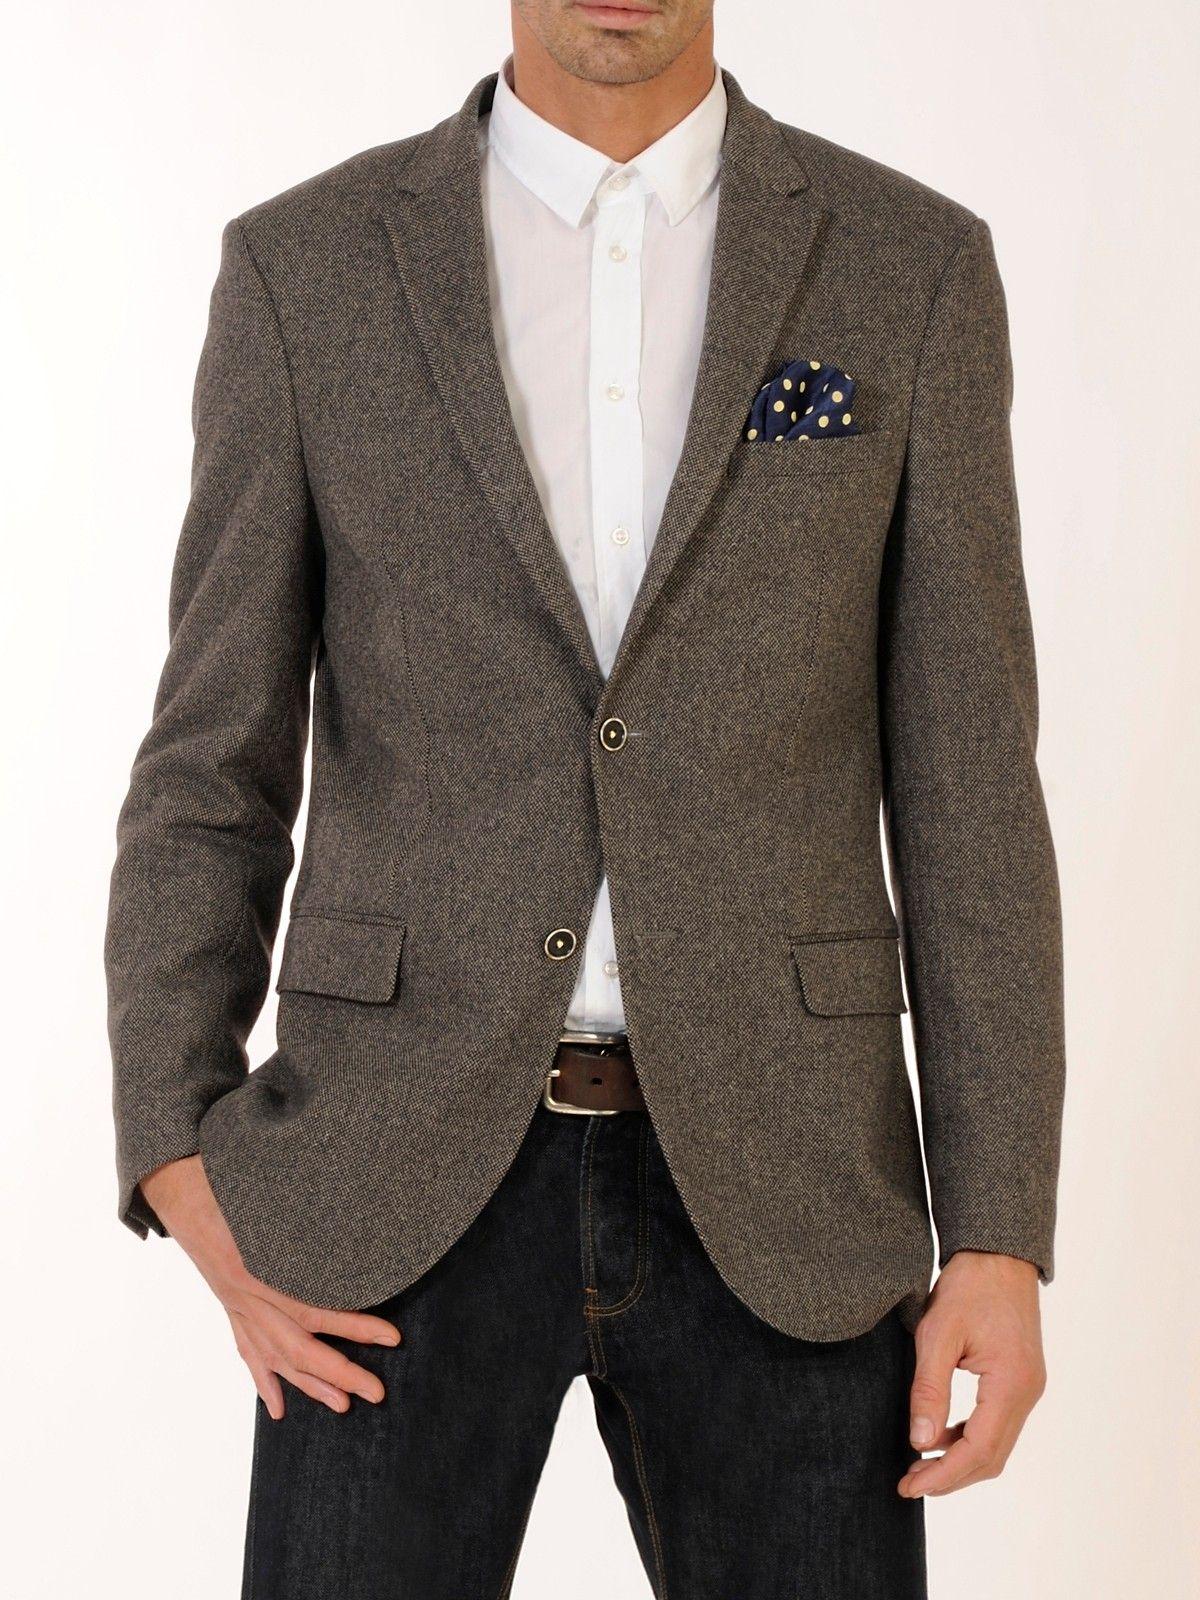 veste homme alessandro en tweed pure laine 120 39 s gris garnico alessandro paris. Black Bedroom Furniture Sets. Home Design Ideas